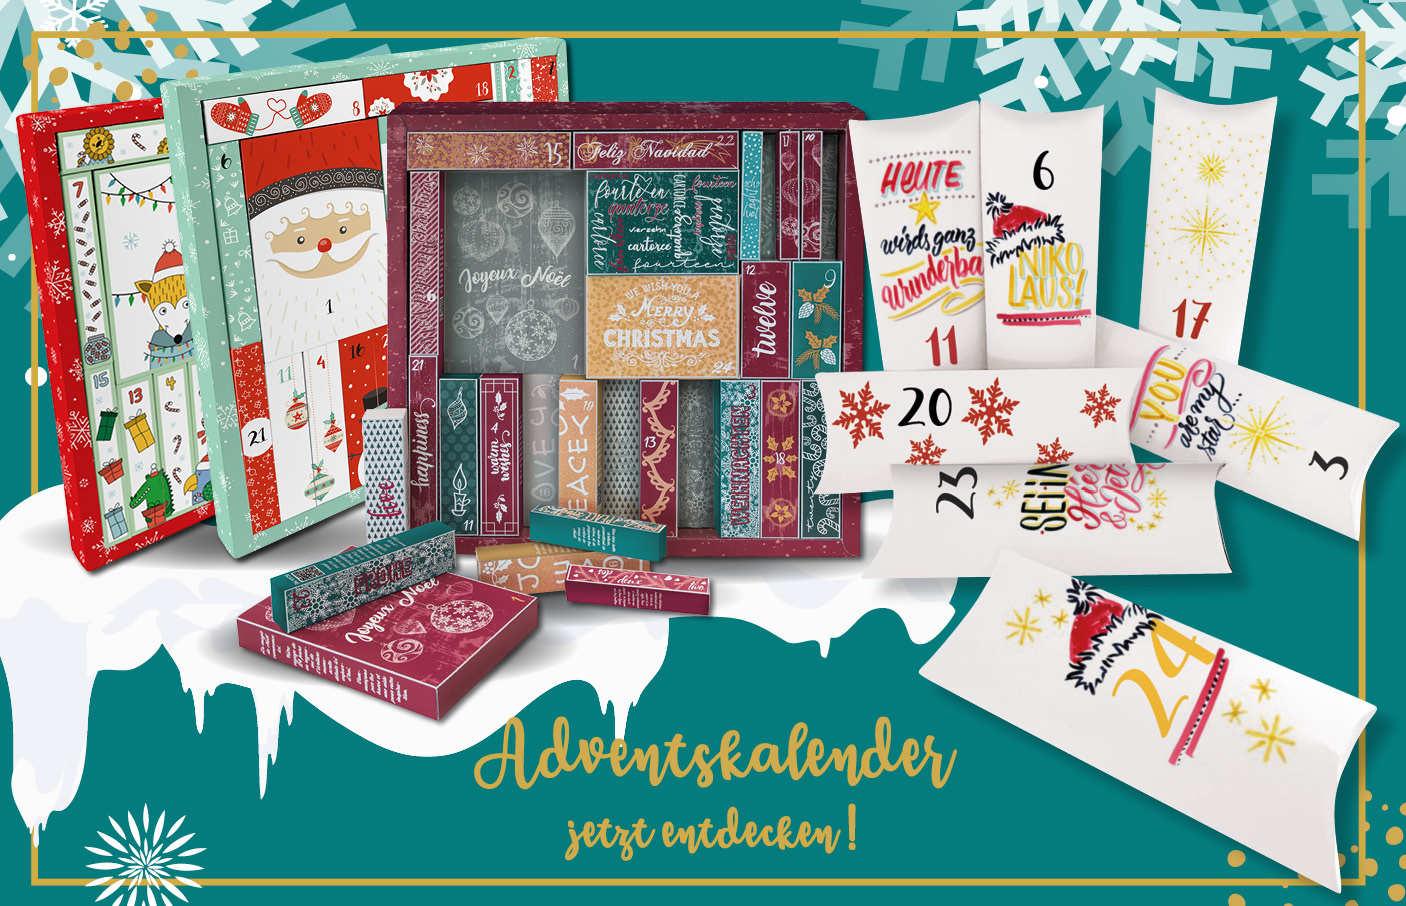 Adventskalender Handlettering, DIY, Kids und Girls for School